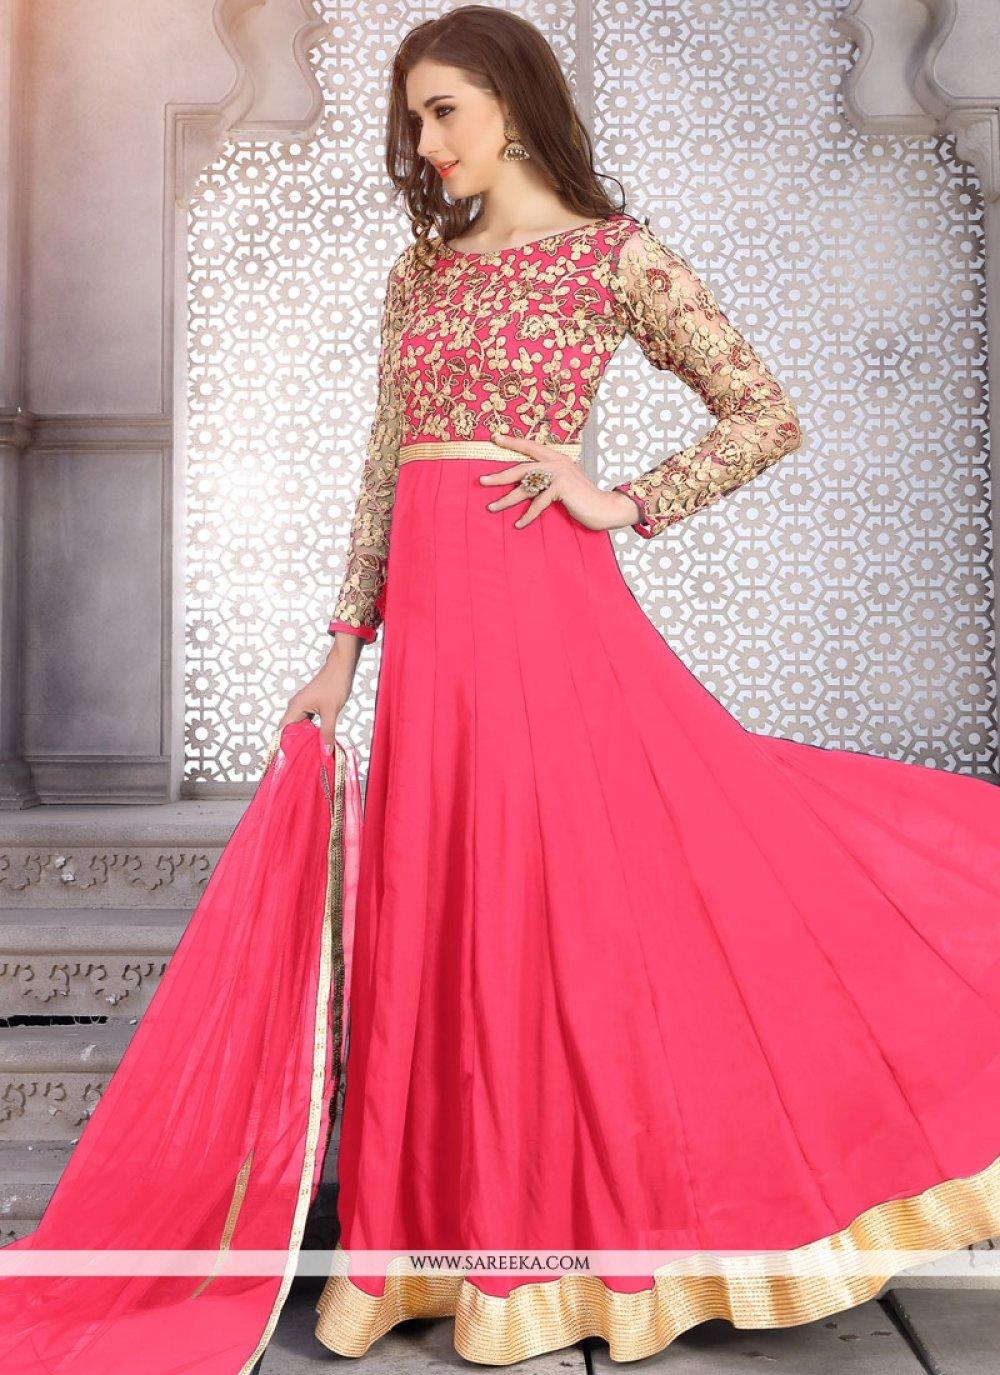 Faux Georgette Pink Embroidered Work Floor Length Anarkali Suit